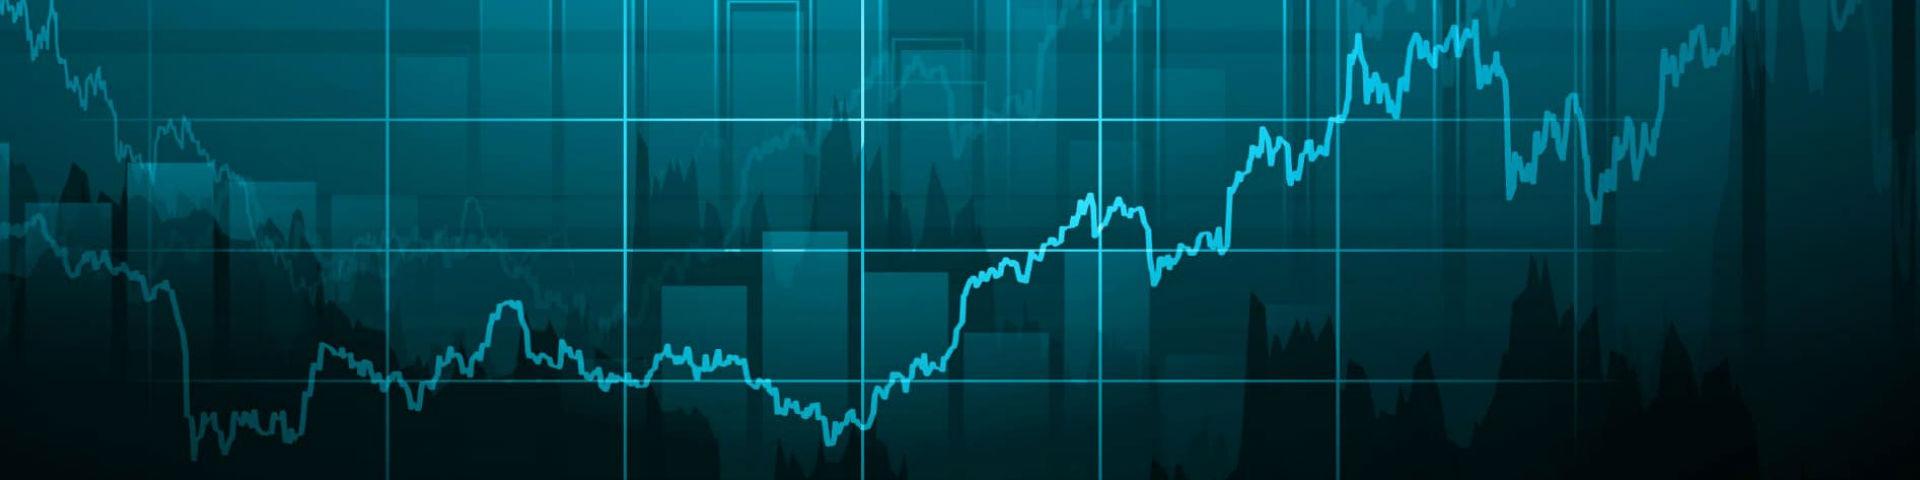 Акции гемблинговой компании 888 Holdings подешевели на 8,4% за сутки